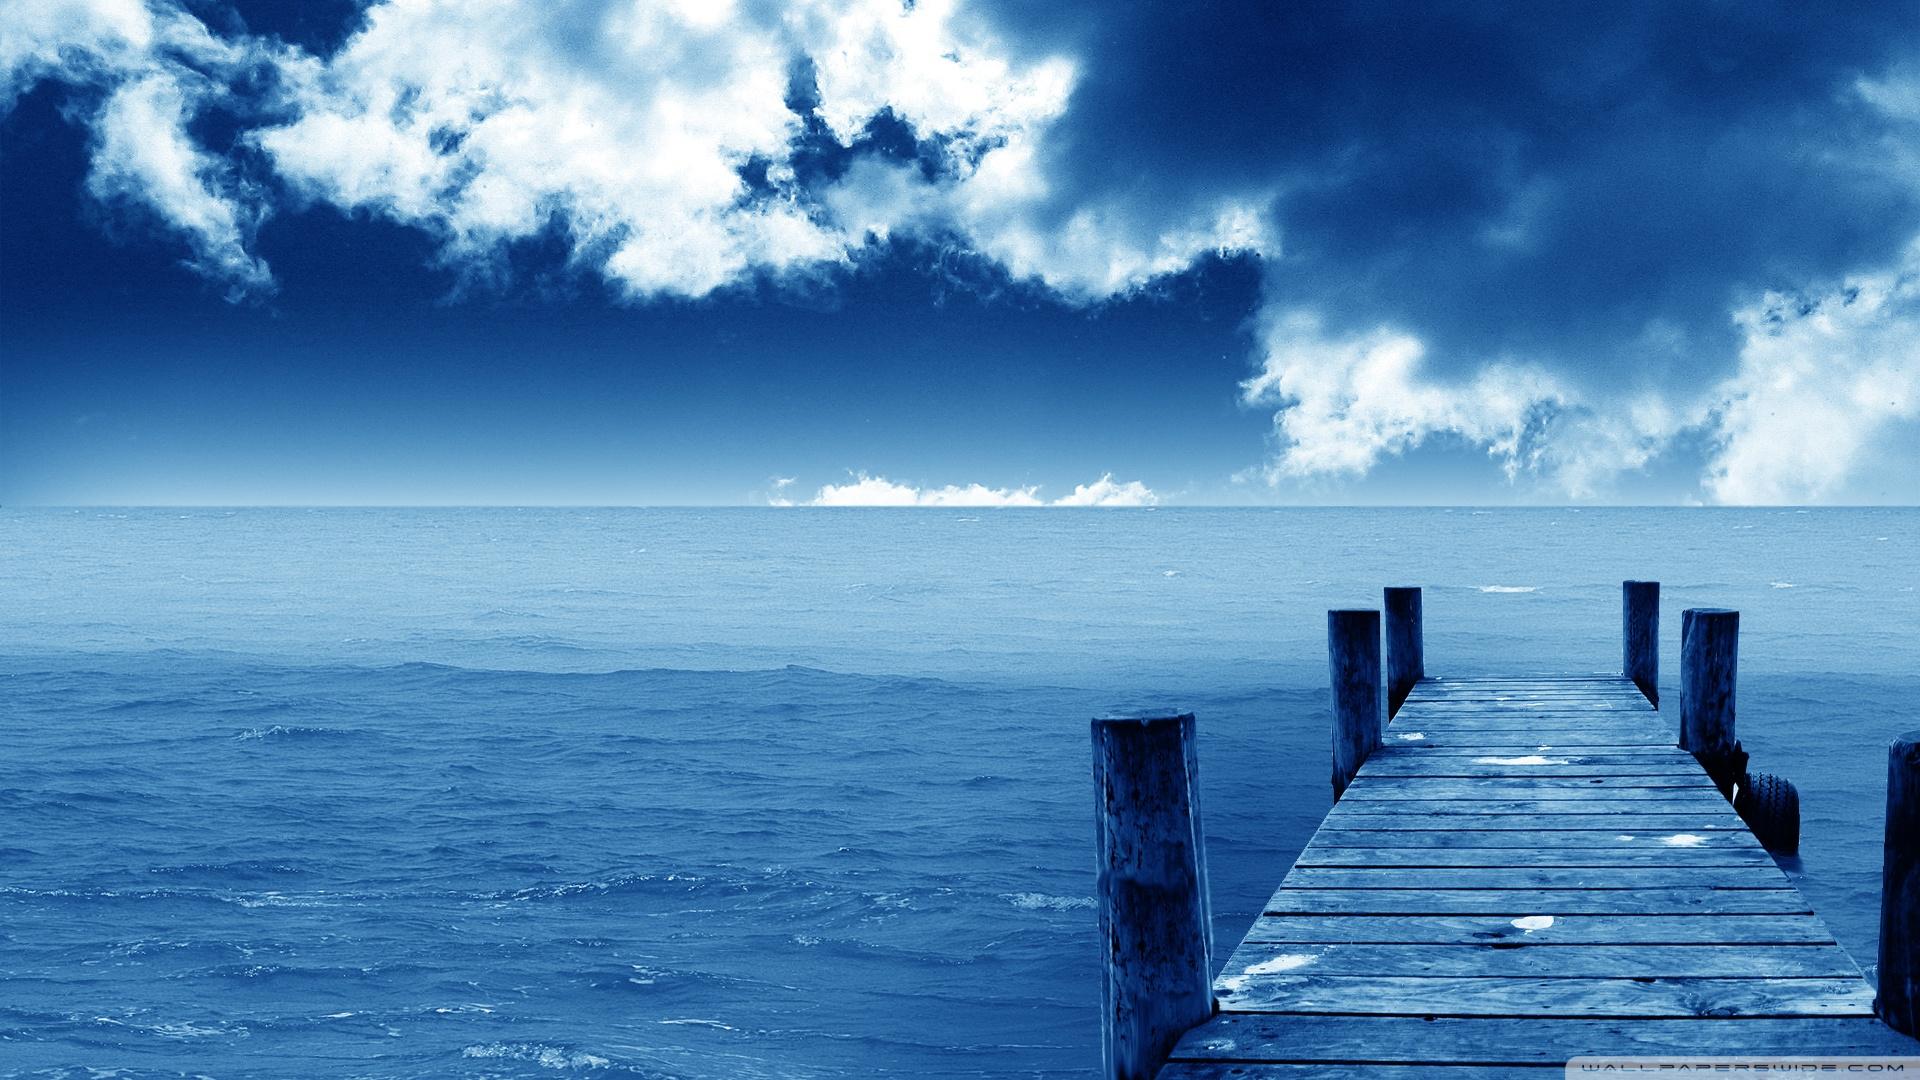 Free download Blue Nature Beach Wallpaper HD wallpapers Blue